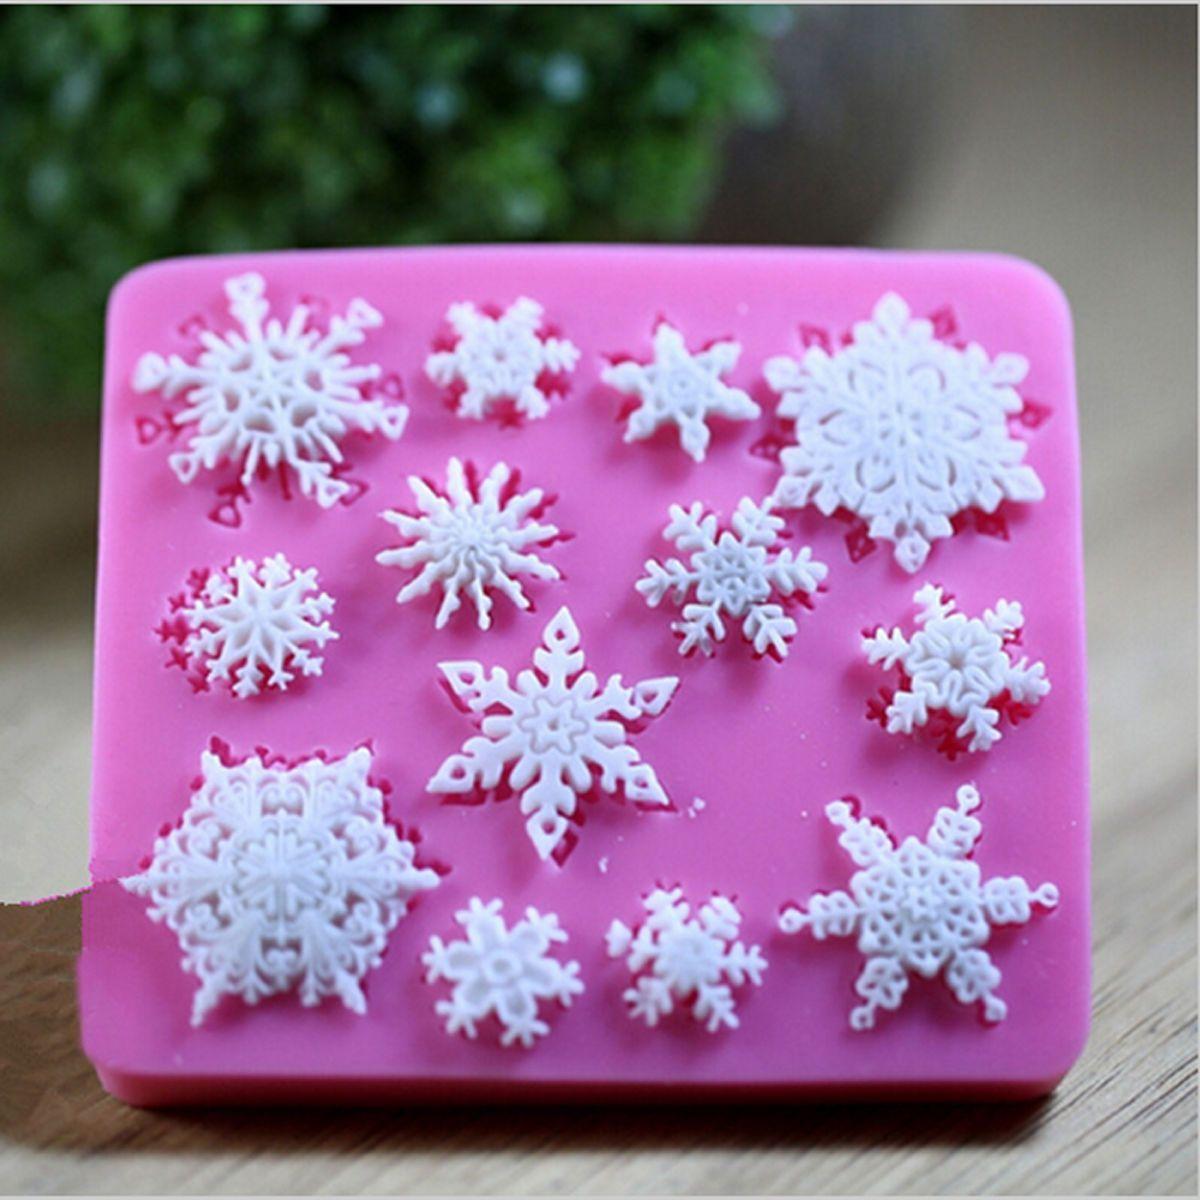 Snowflake Silicone Fondant Cake Mold Soap Chocolate Candy